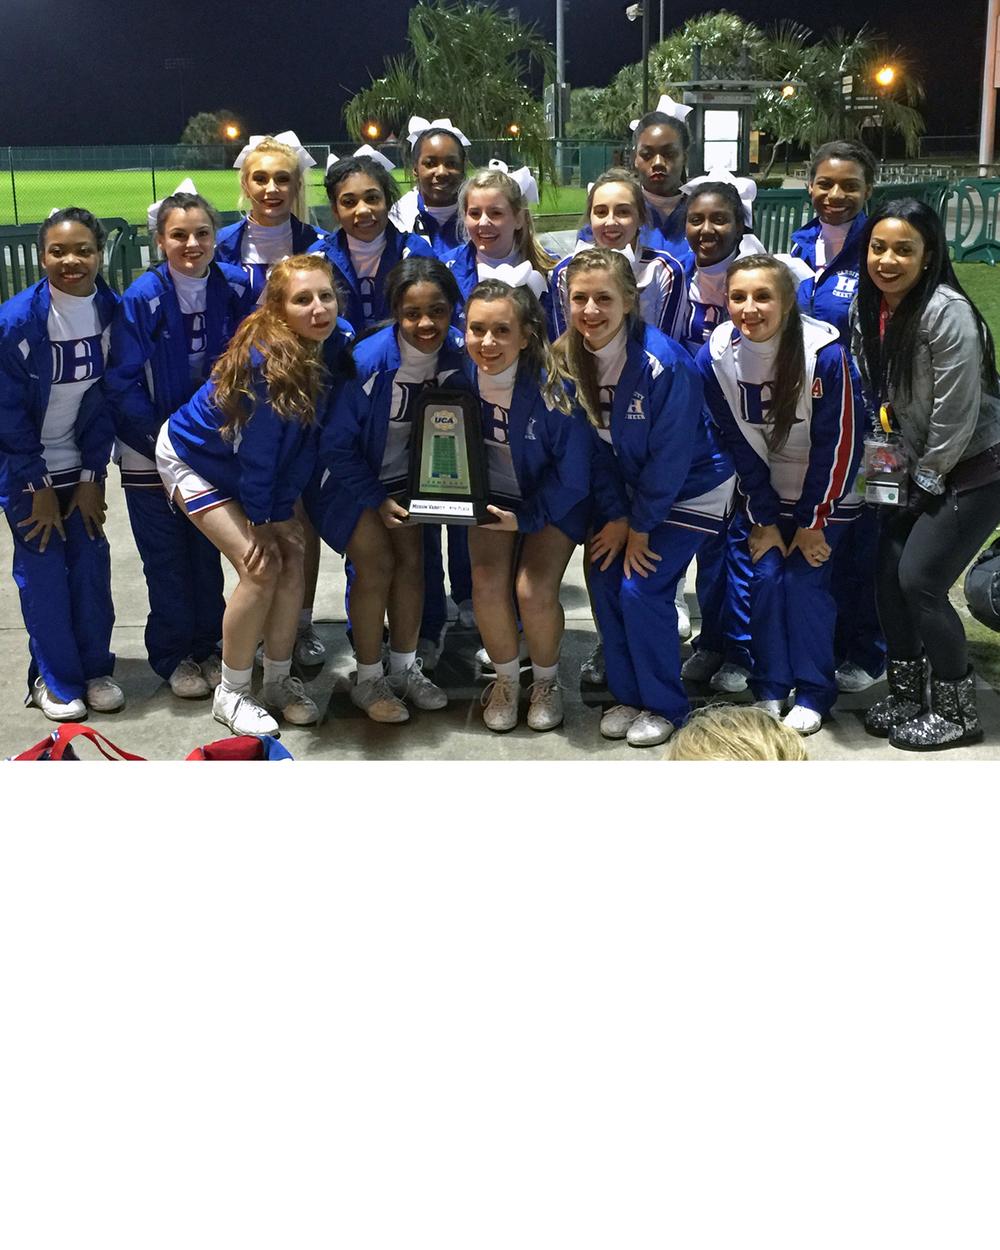 Varsity cheer team places 4th at Nationals